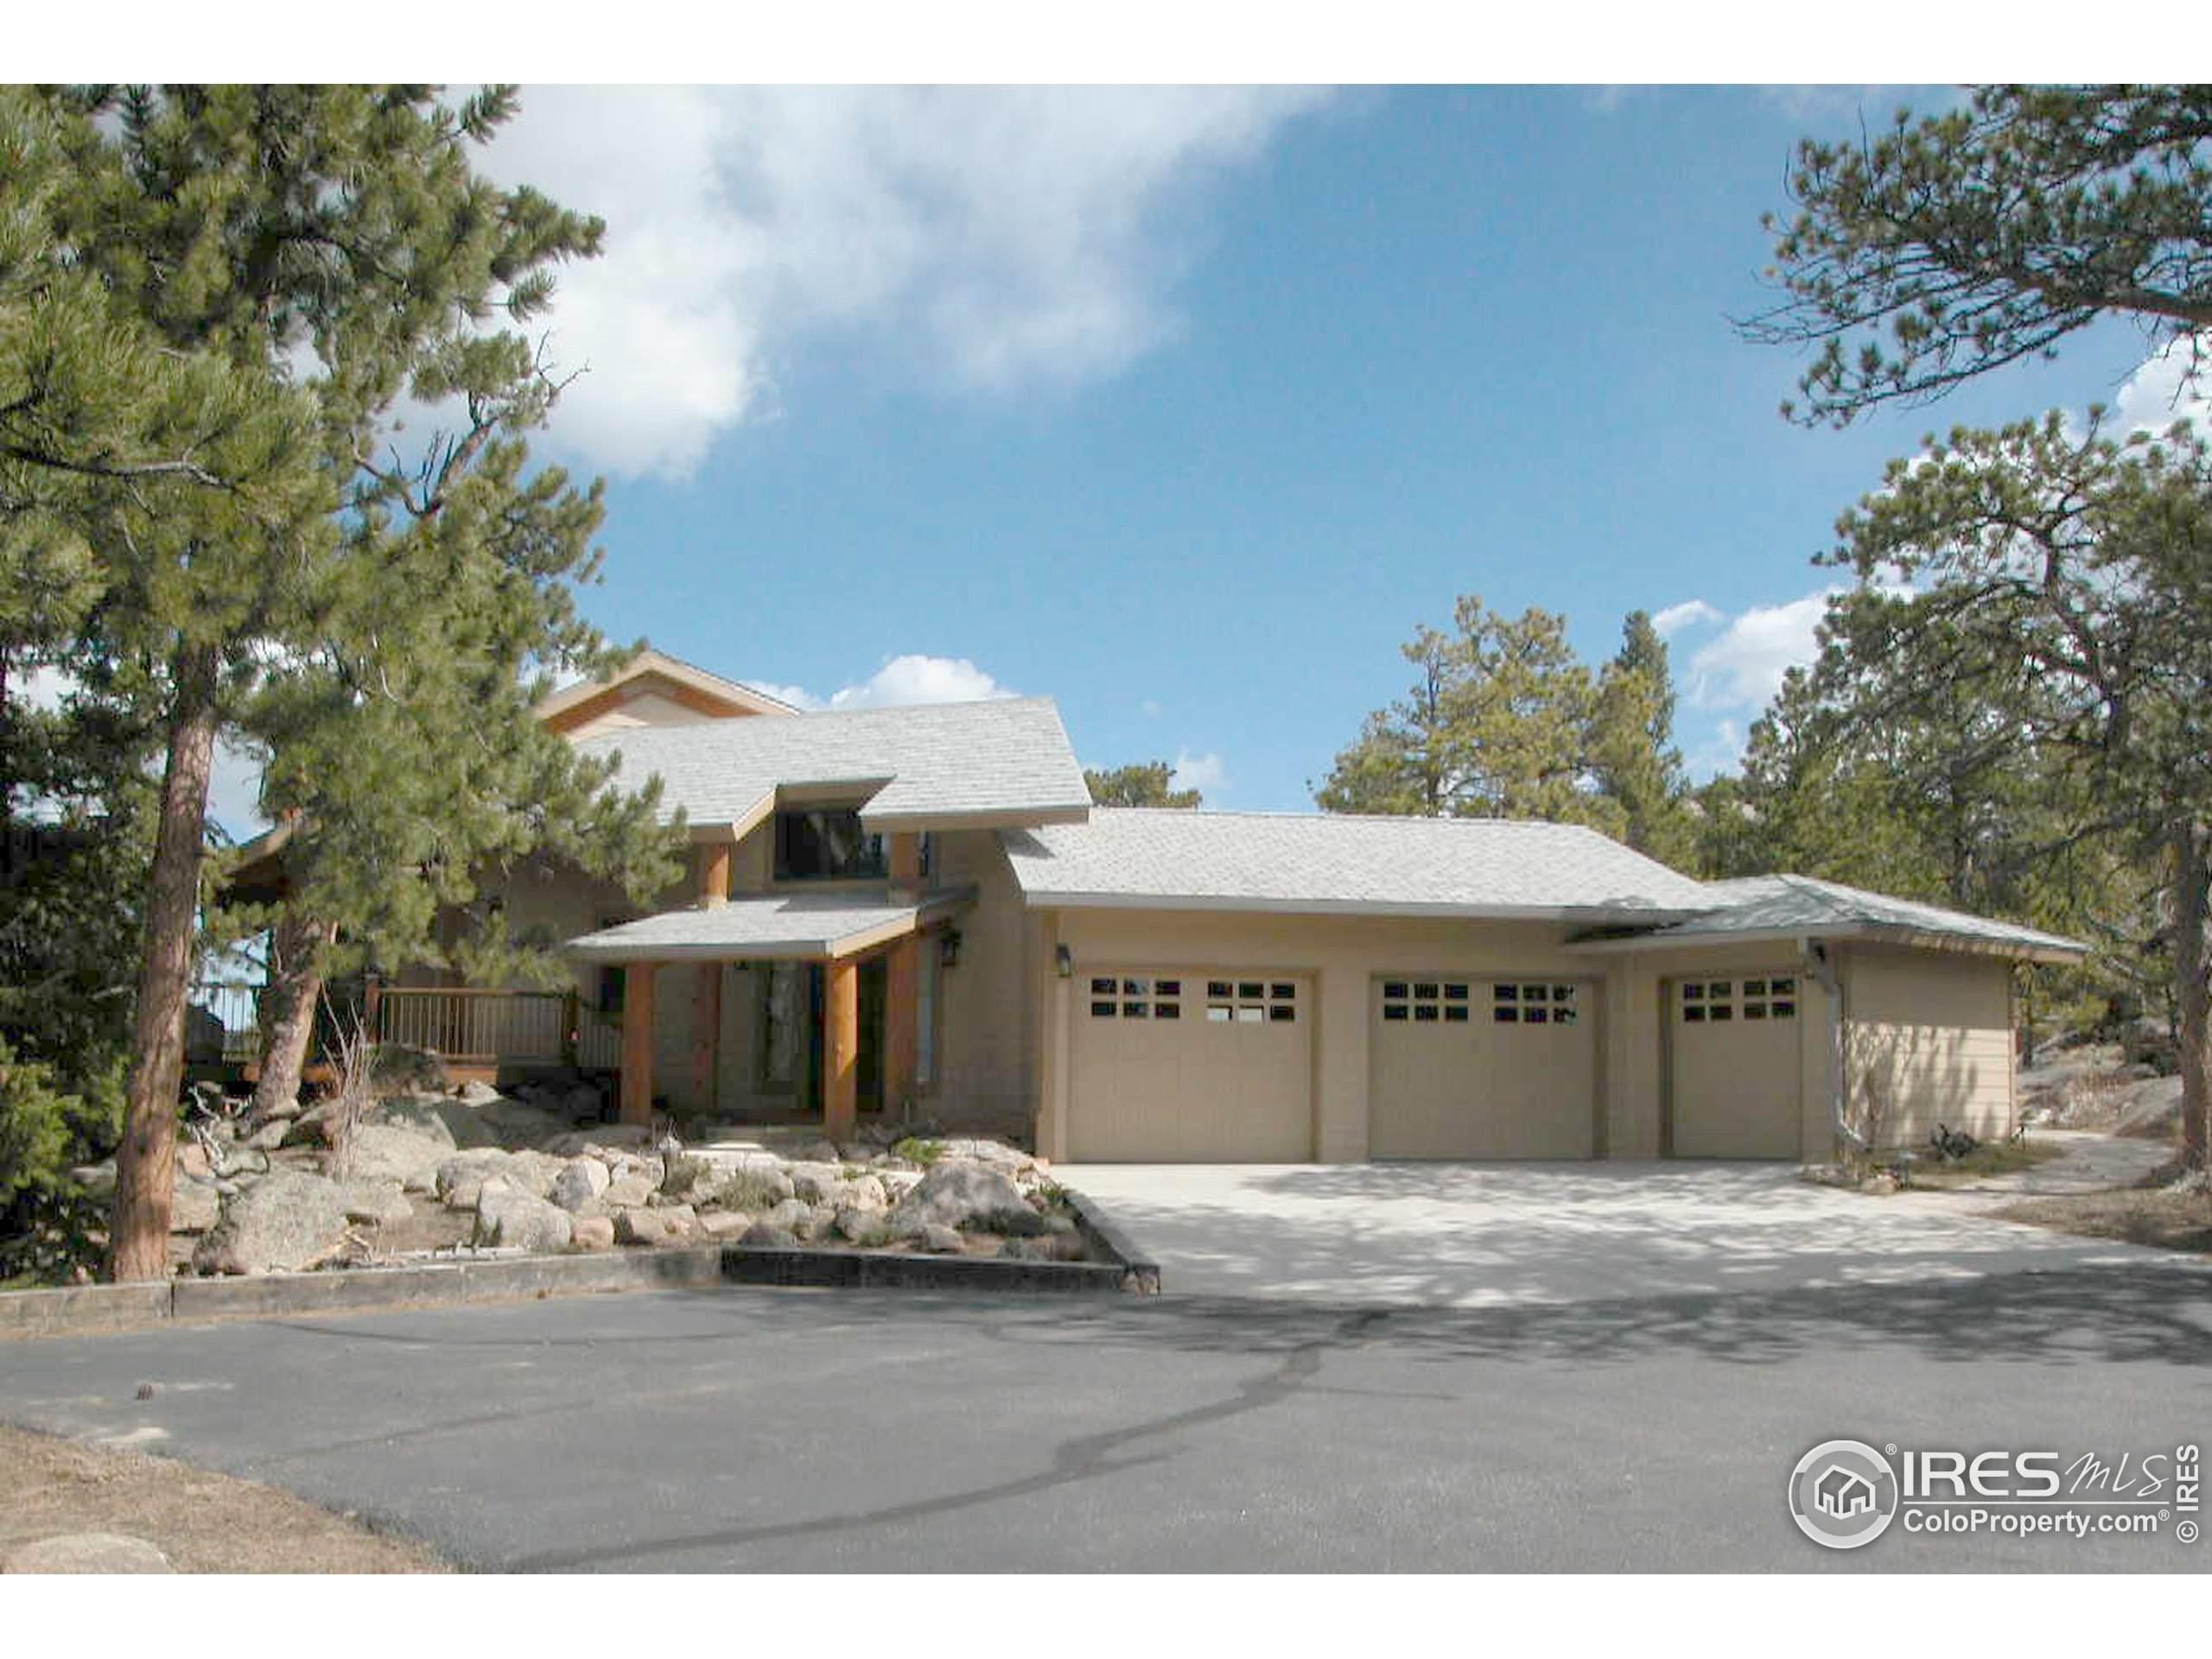 147 Ash St, Hudson, CO 80642 (MLS #926551) :: Wheelhouse Realty